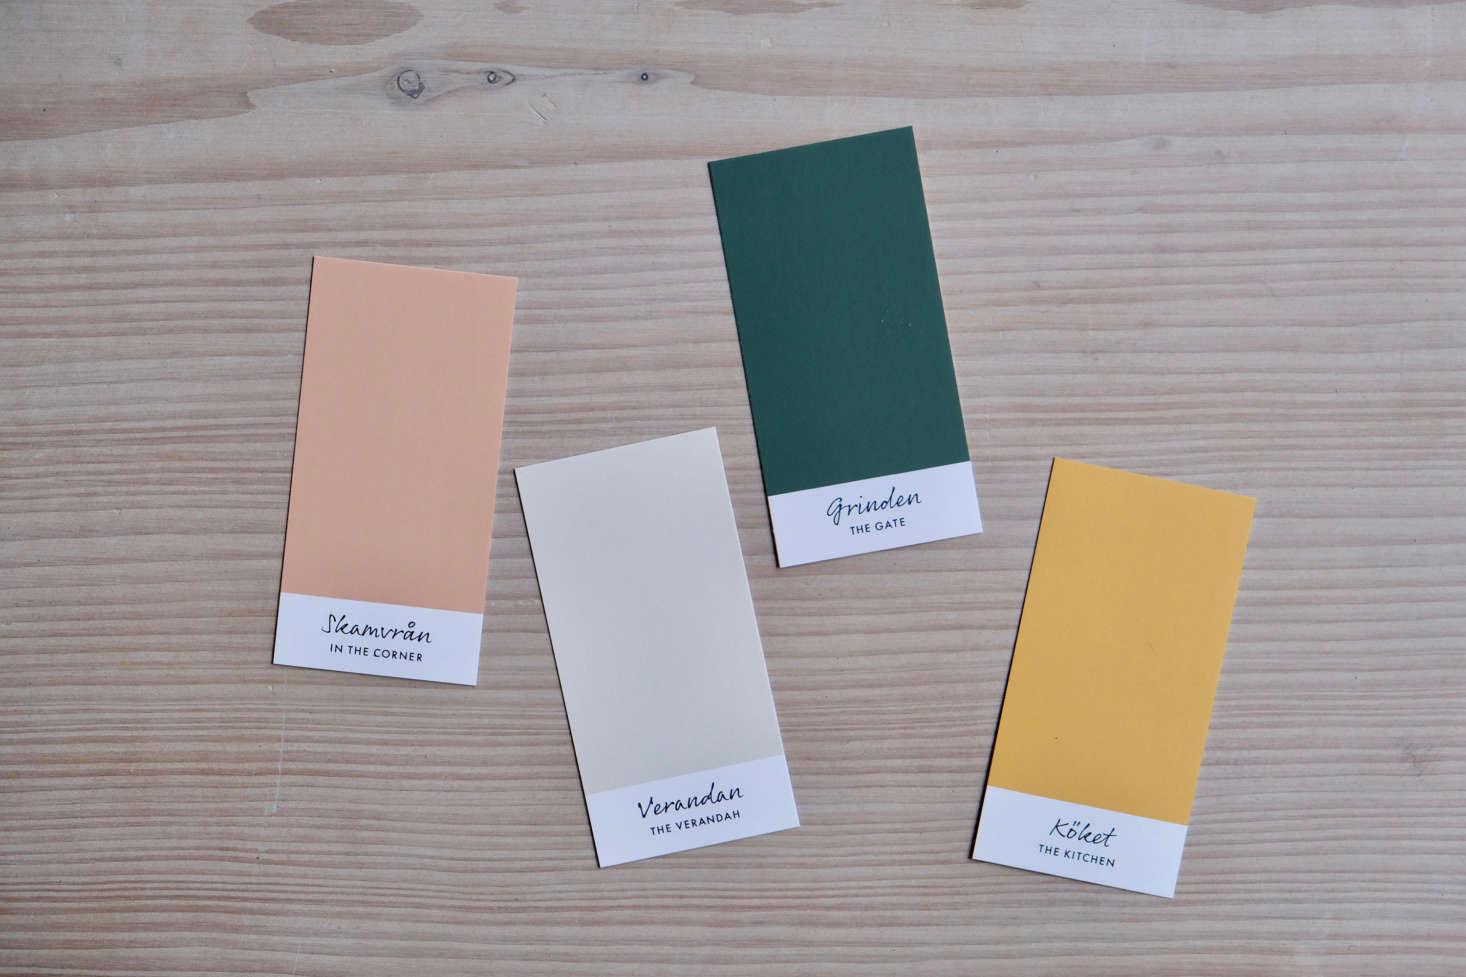 The Ett Hem palette includes (L to R) In the Corner (Skamvrån), The Verandah (Verandan), The Gate (Grinden), and The Kitchen (Köket), all named after Carl Larsson paintings.